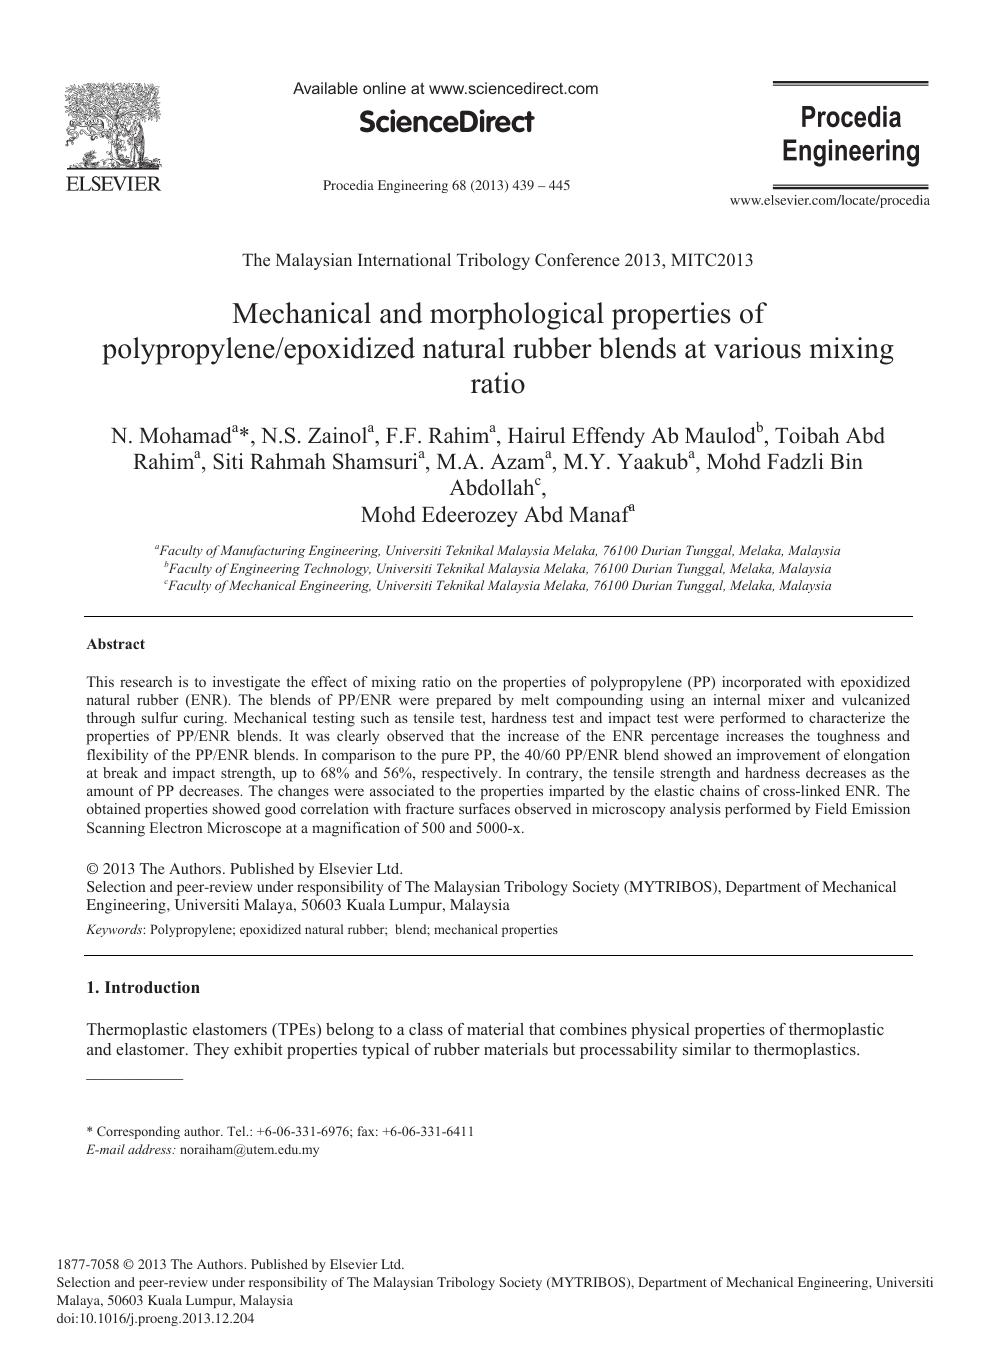 Mechanical and Morphological Properties of Polypropylene/Epoxidized